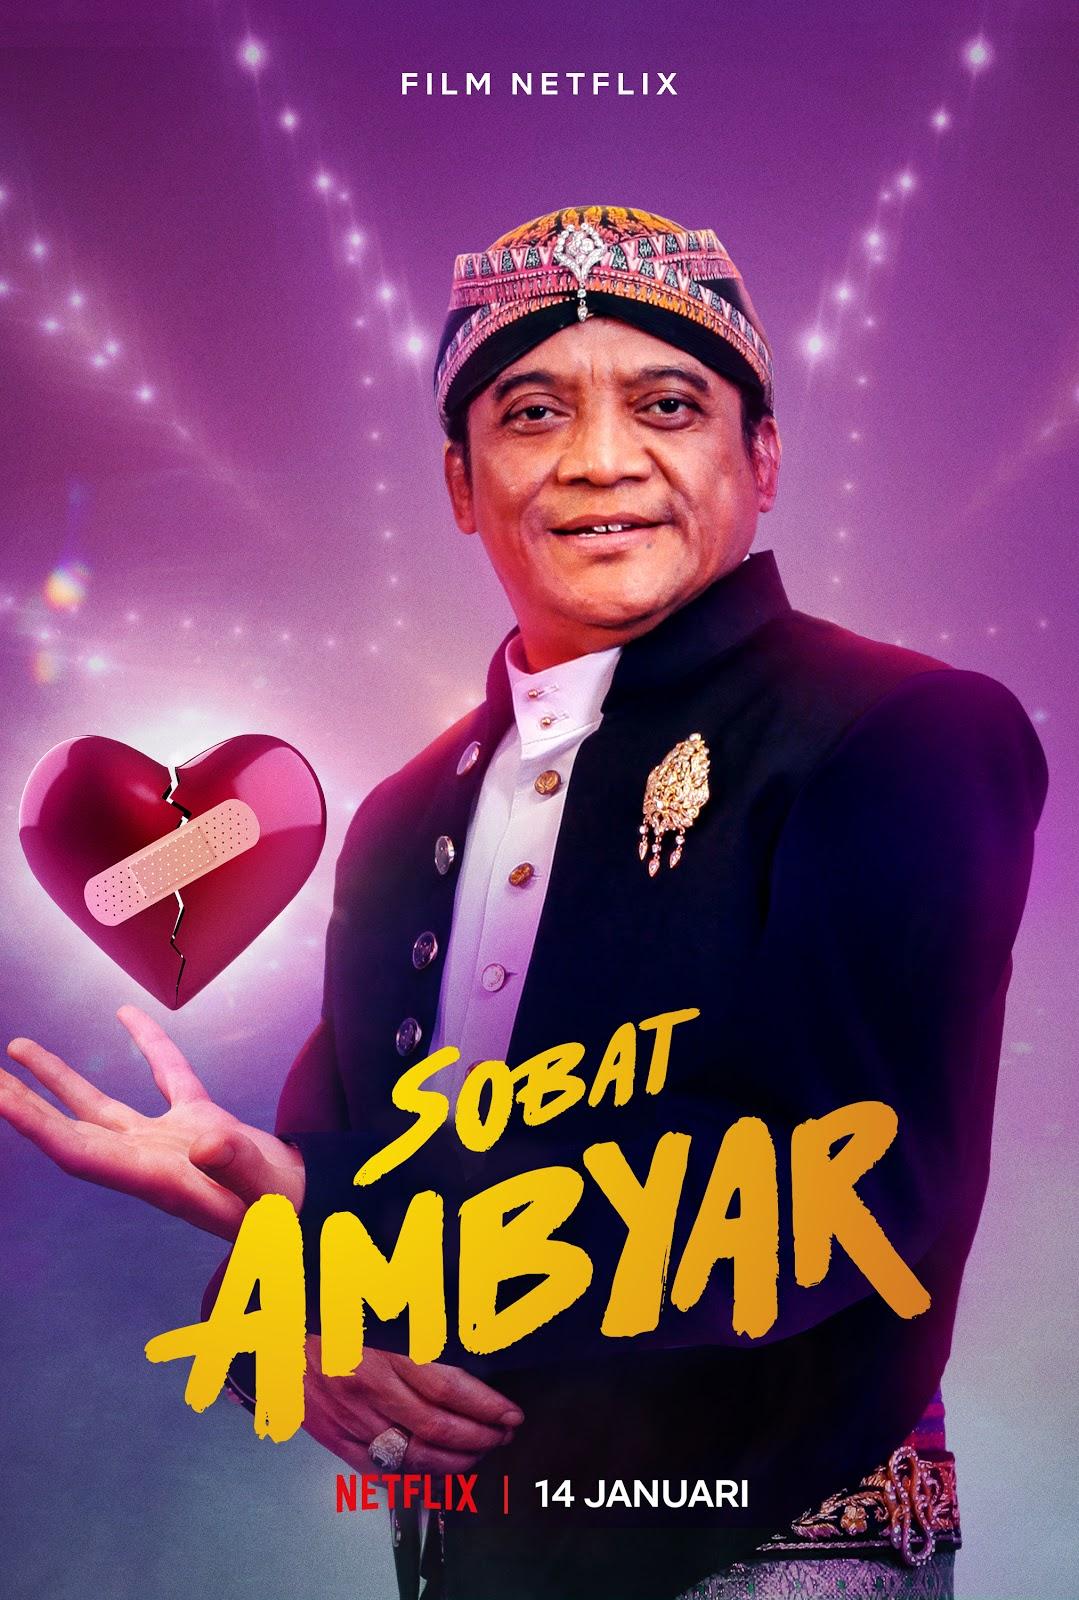 Download The Heartbreak Club: Sobat Ambyar (2021) Full Movie   Stream The Heartbreak Club: Sobat Ambyar (2021) Full HD   Watch The Heartbreak Club: Sobat Ambyar (2021)   Free Download The Heartbreak Club: Sobat Ambyar (2021) Full Movie